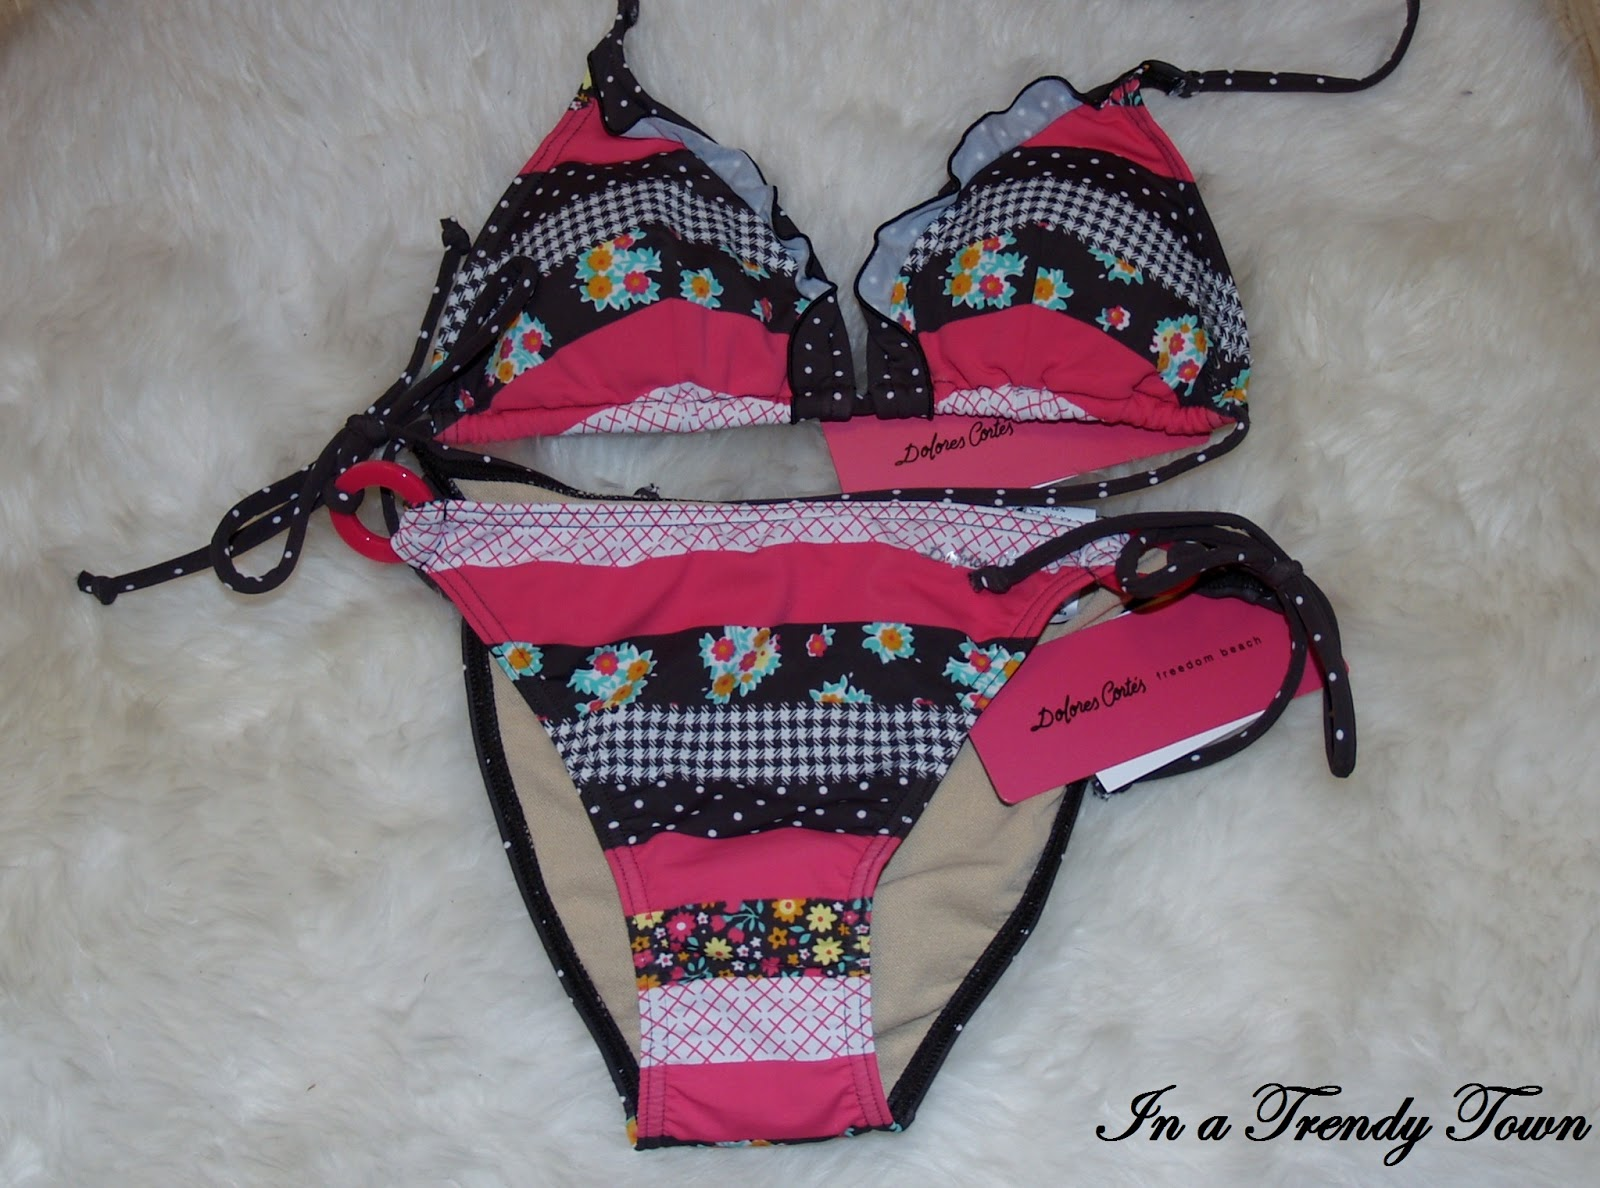 Bikini Dolores Cortés